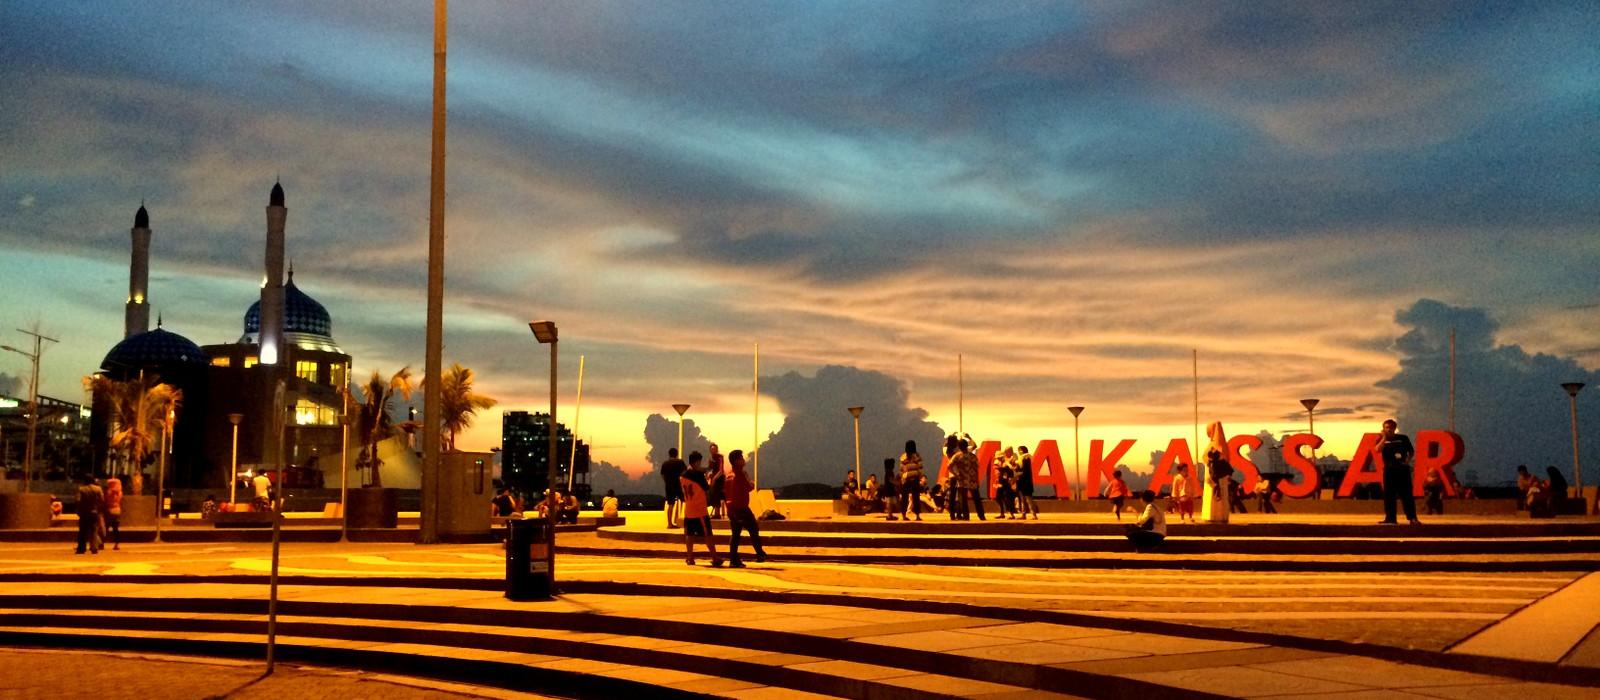 Reiseziel Sulawesi, Makassar Indonesien